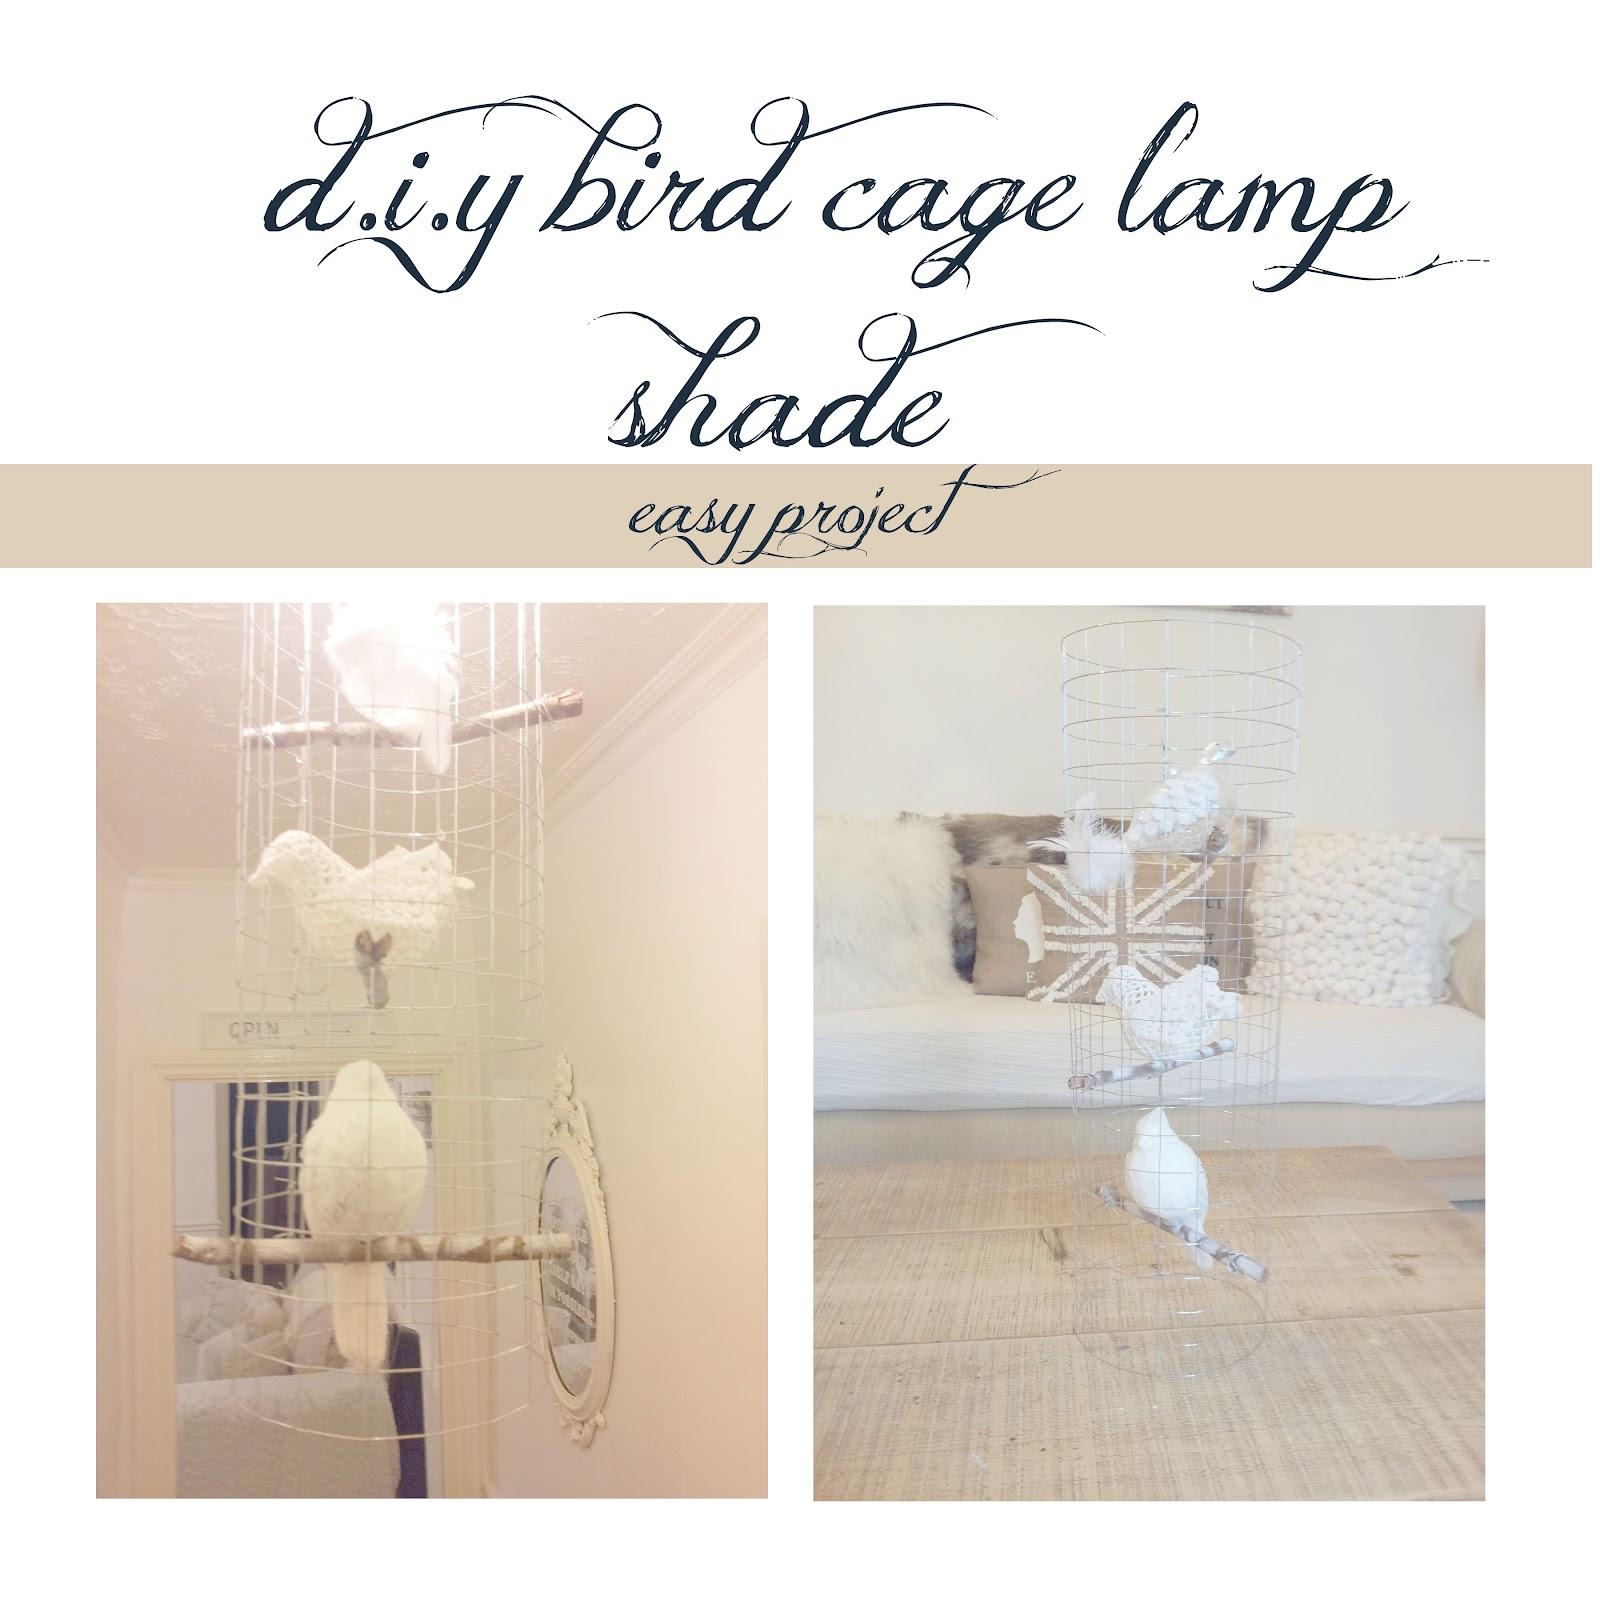 Diy bird cage lamp shade twigg studios diy bird cage lamp shade aloadofball Image collections